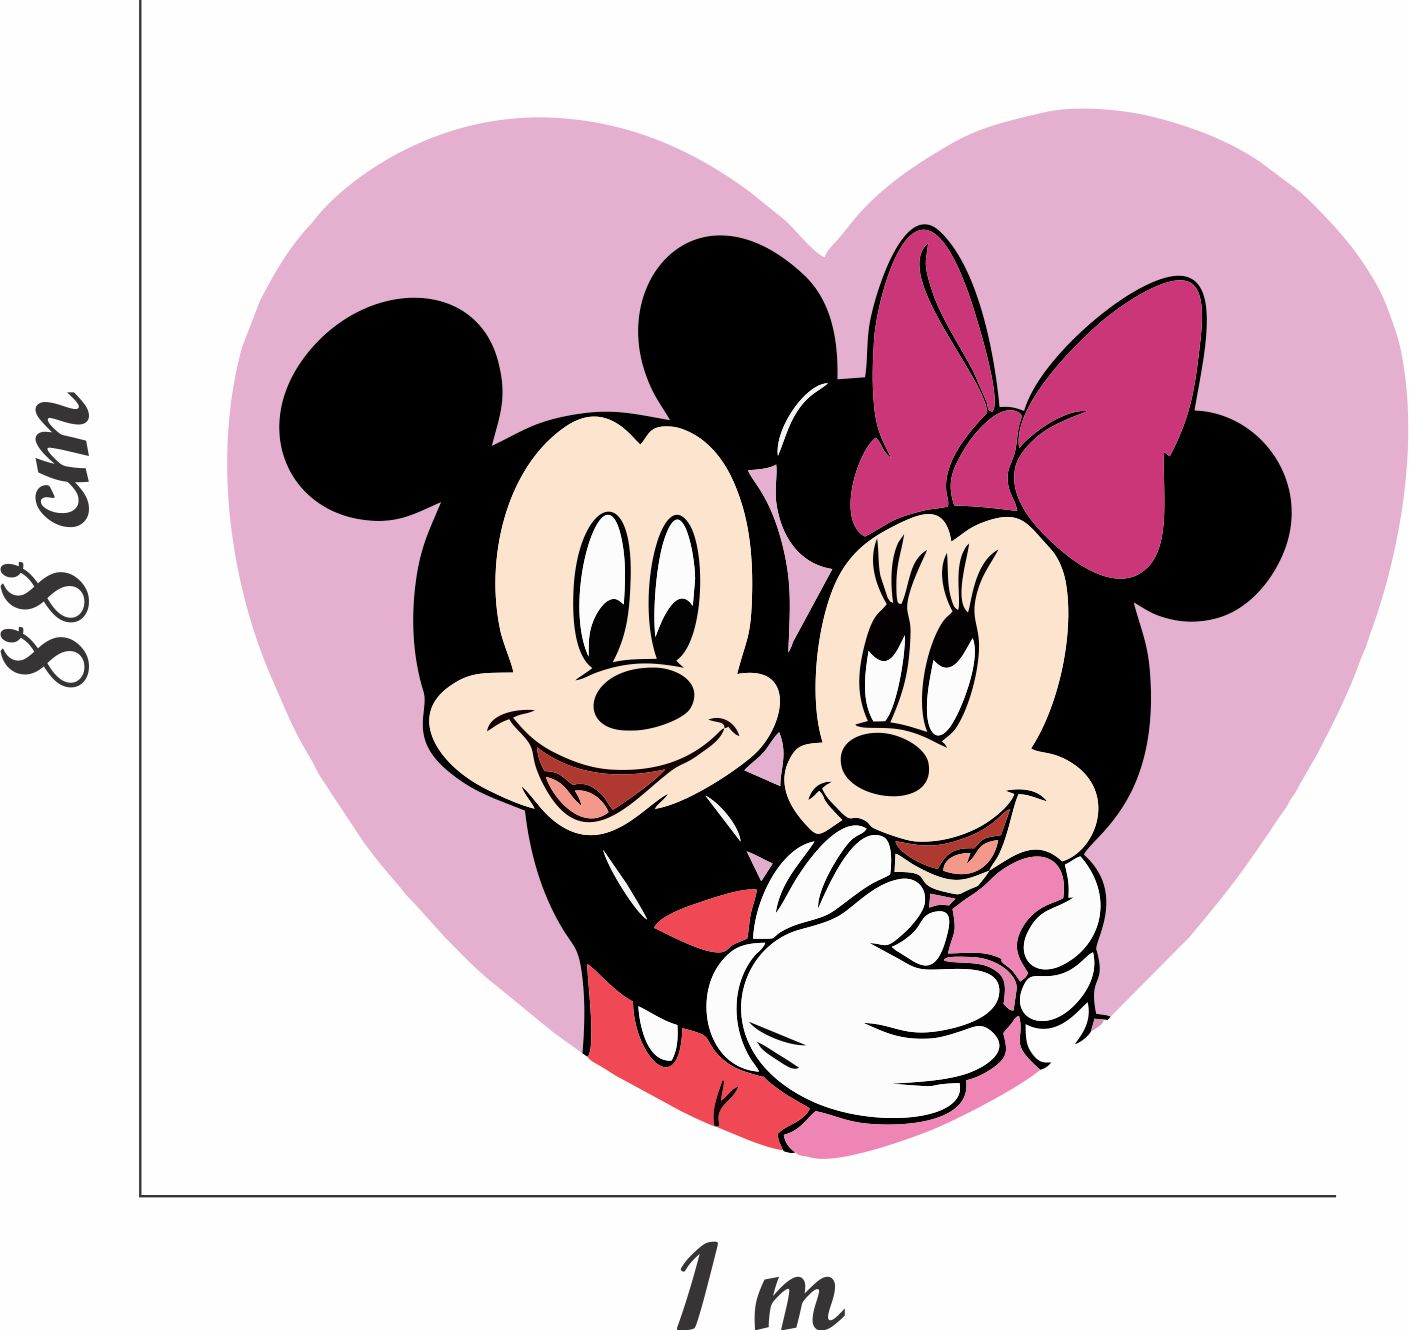 Adesivo Parede Mickey Mouse Minnie Casal No Elo7 Colar Adesivos